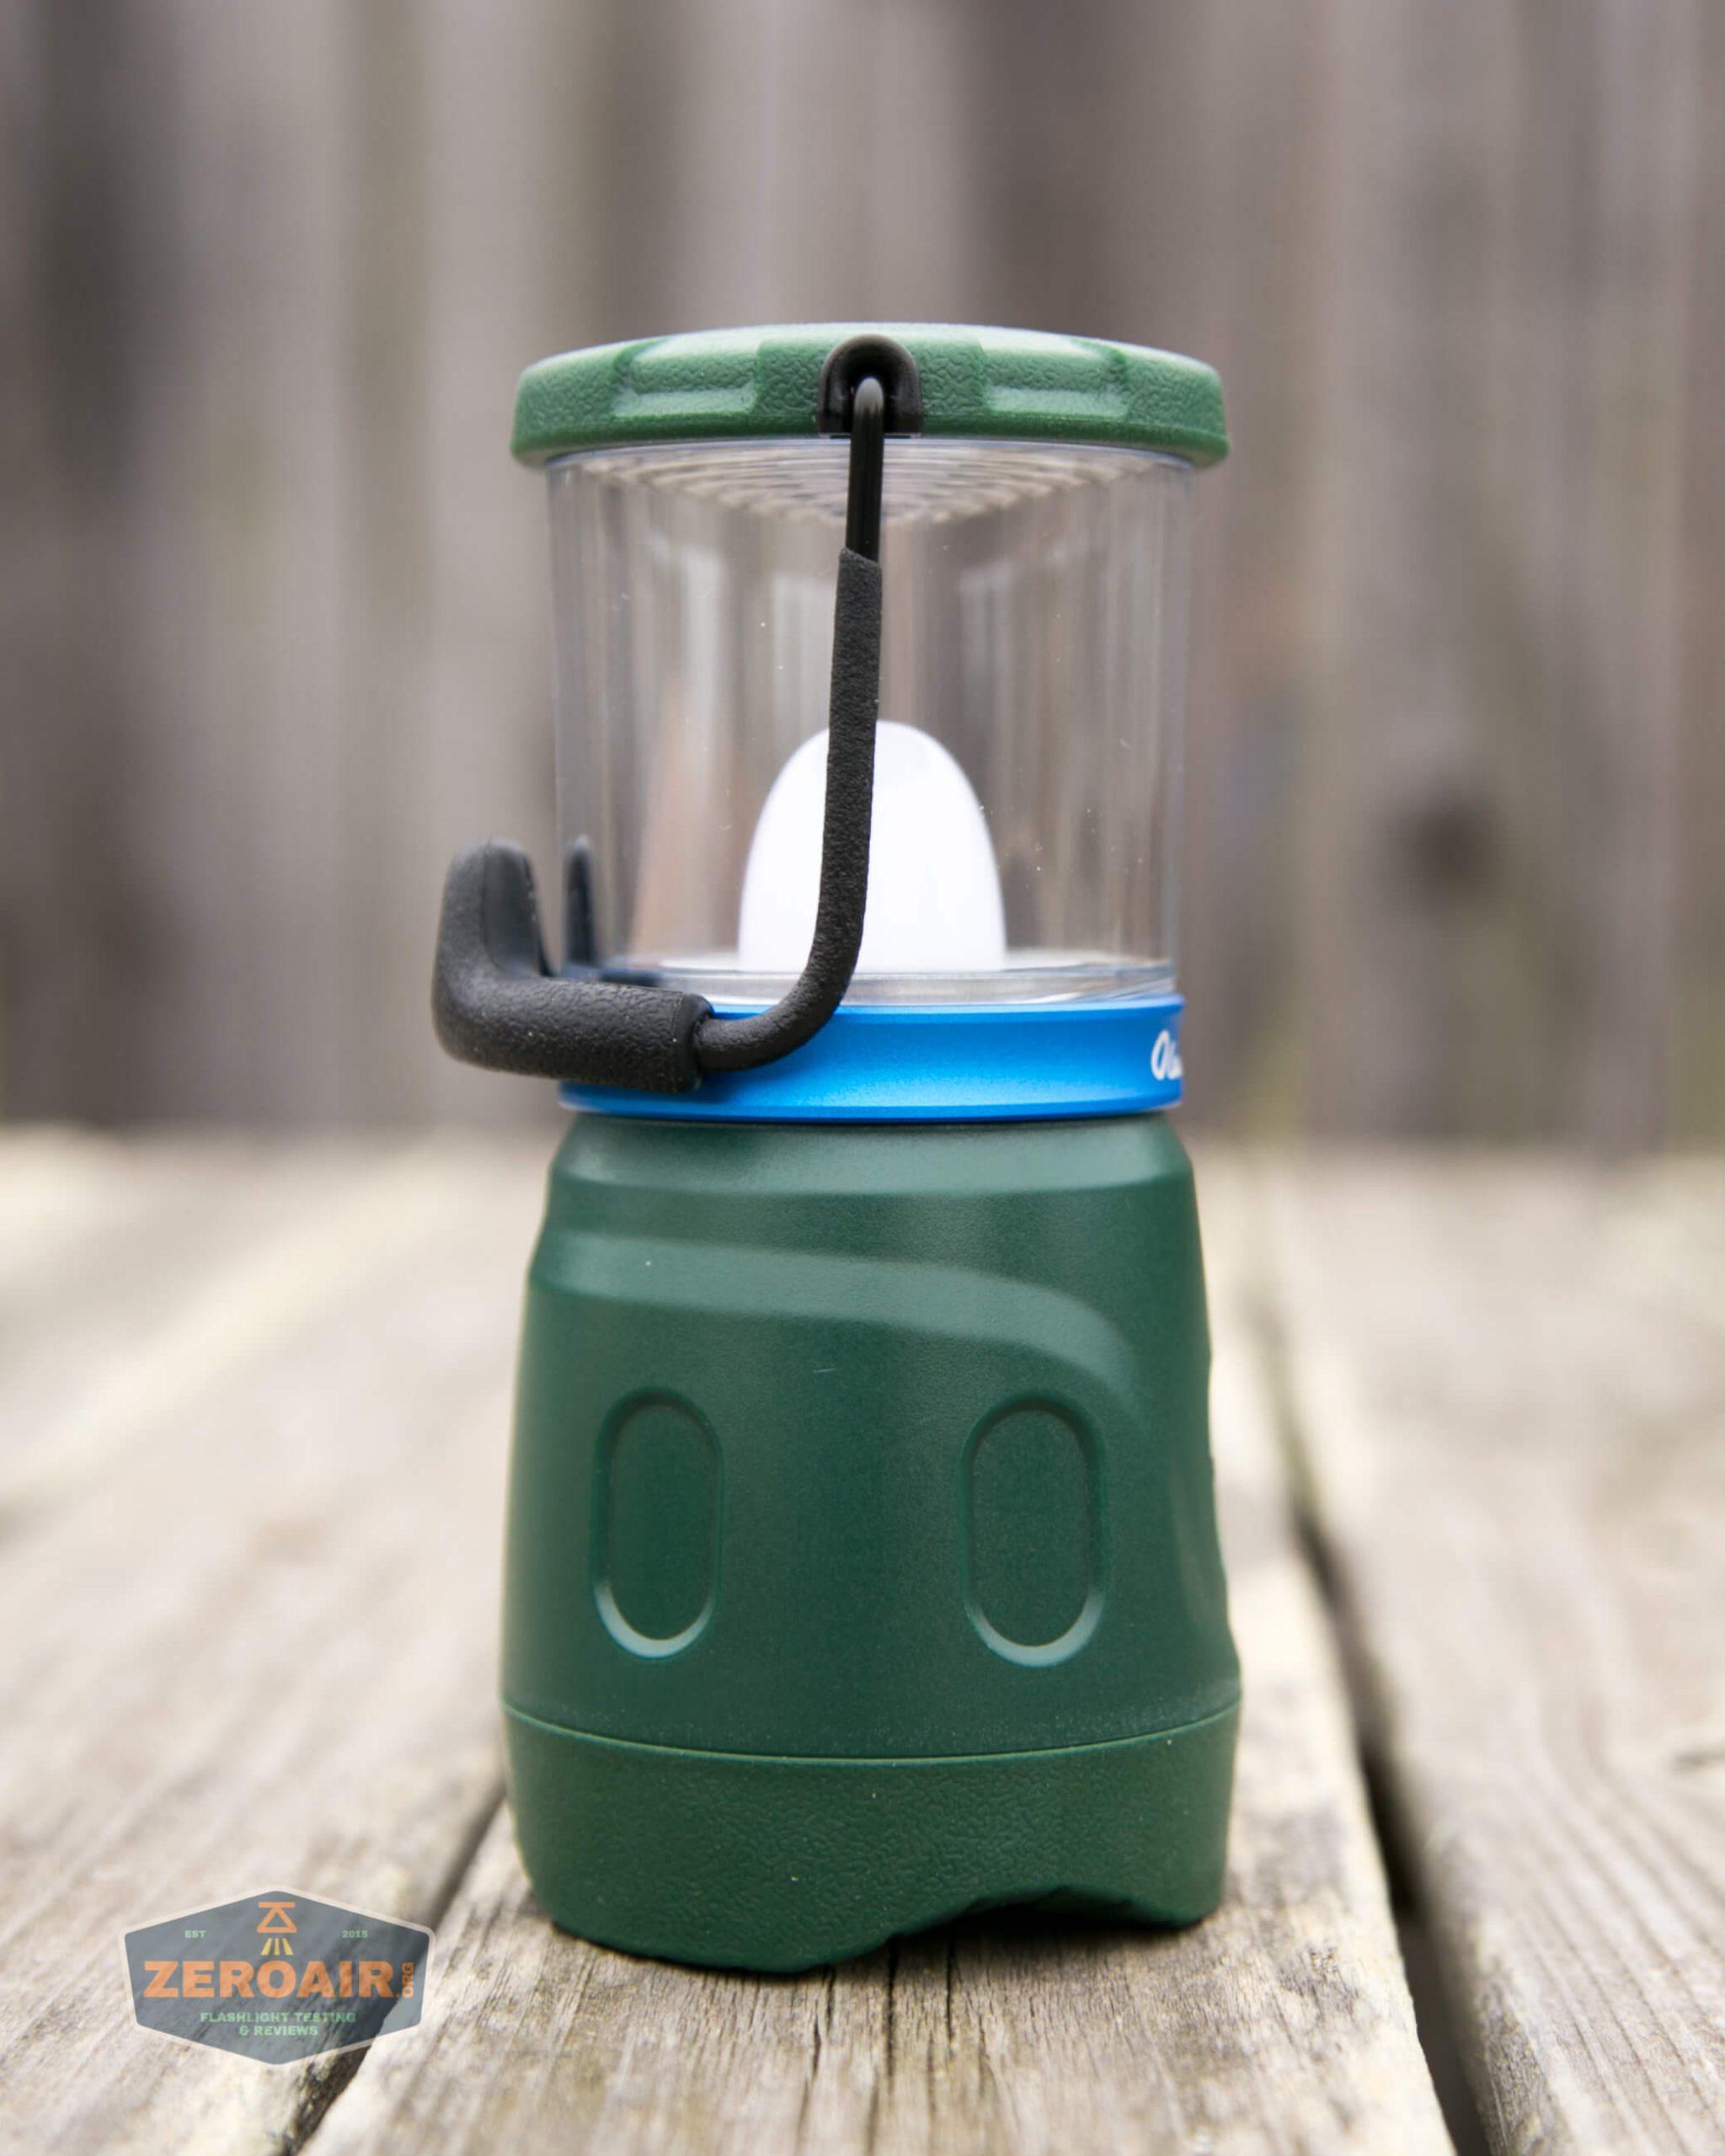 olight olantern lantern quarter shot